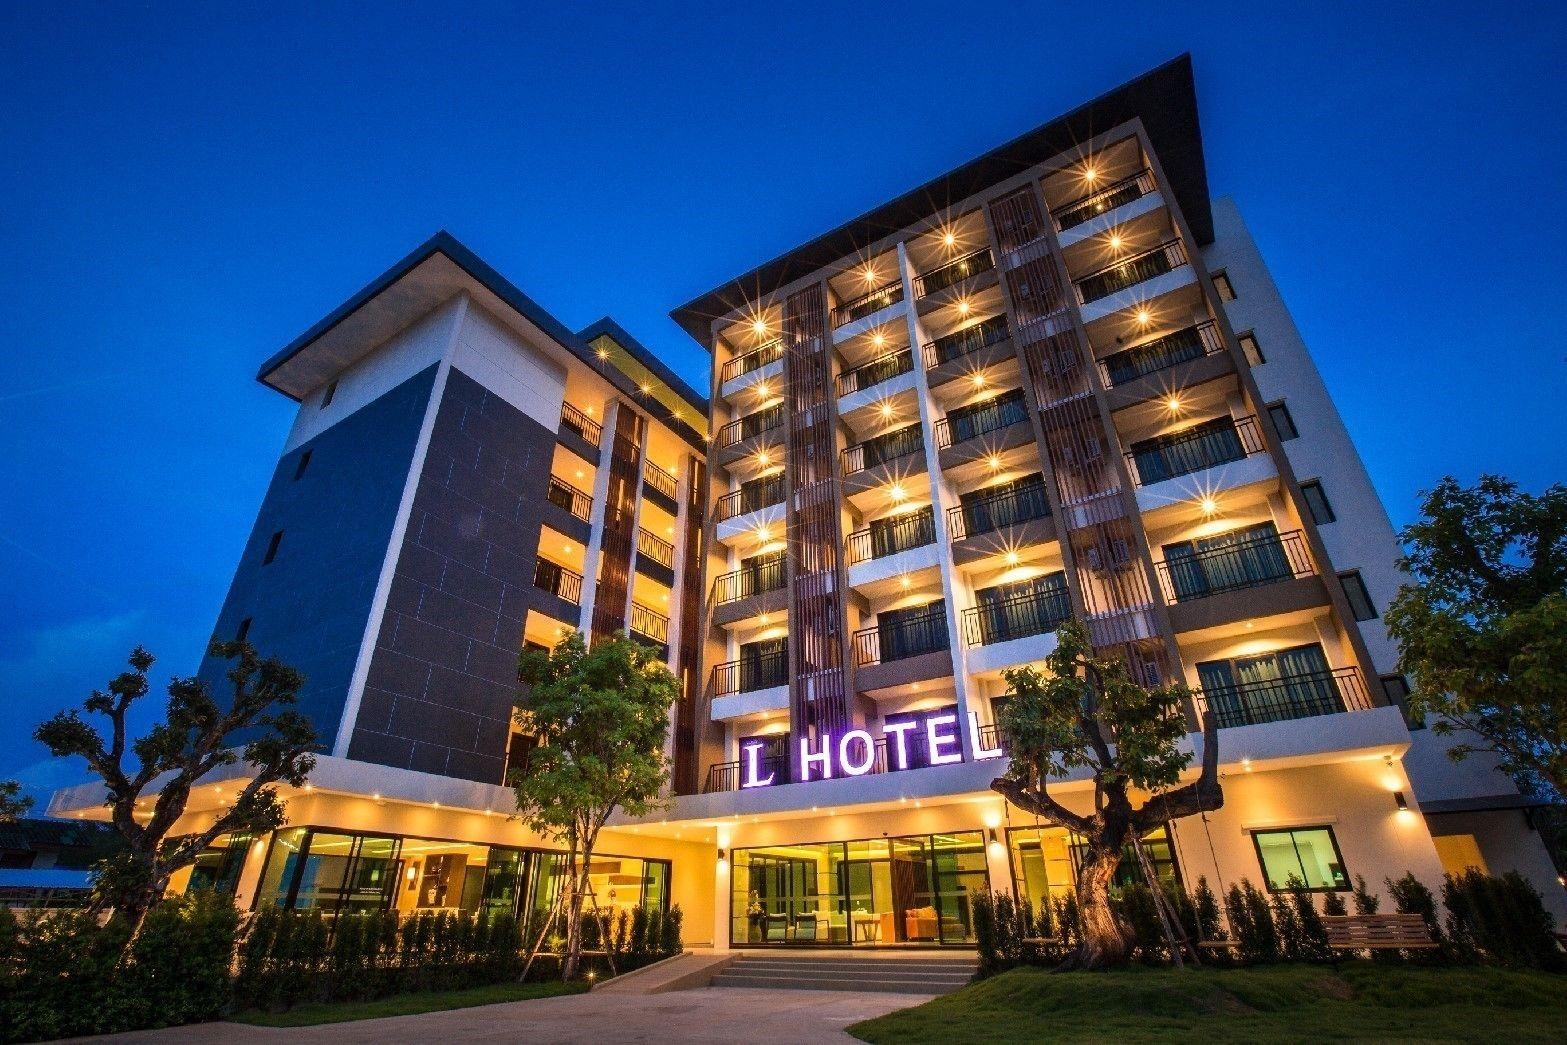 L Hotel, Muang Khon Kaen